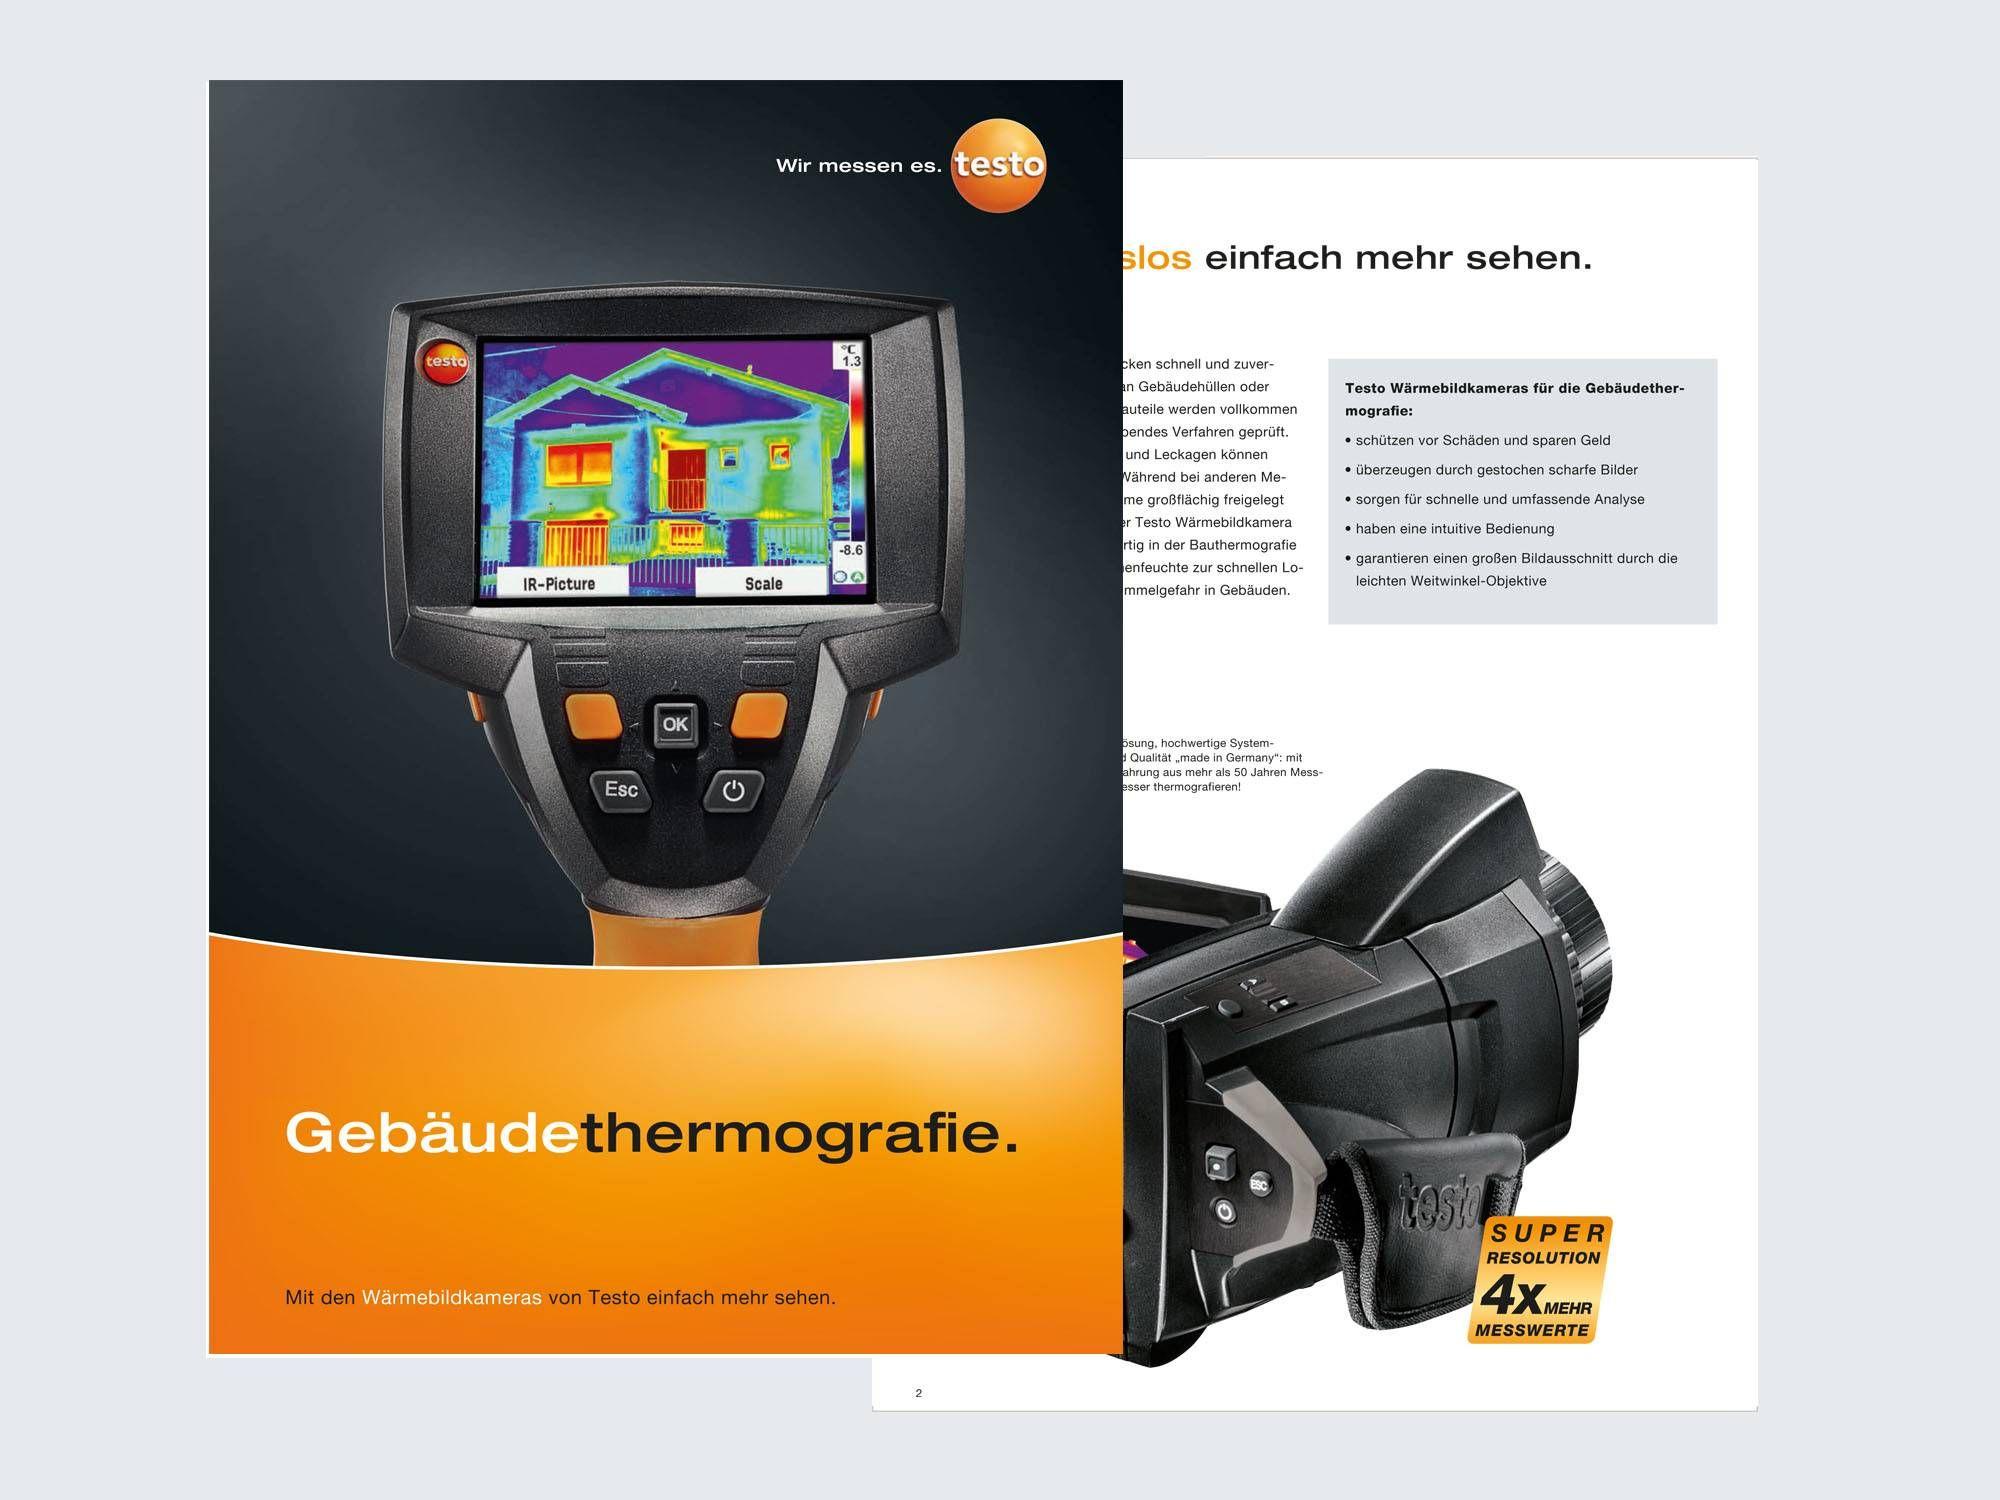 fibel-gebaeudethermografie-download-vorschau.jpg